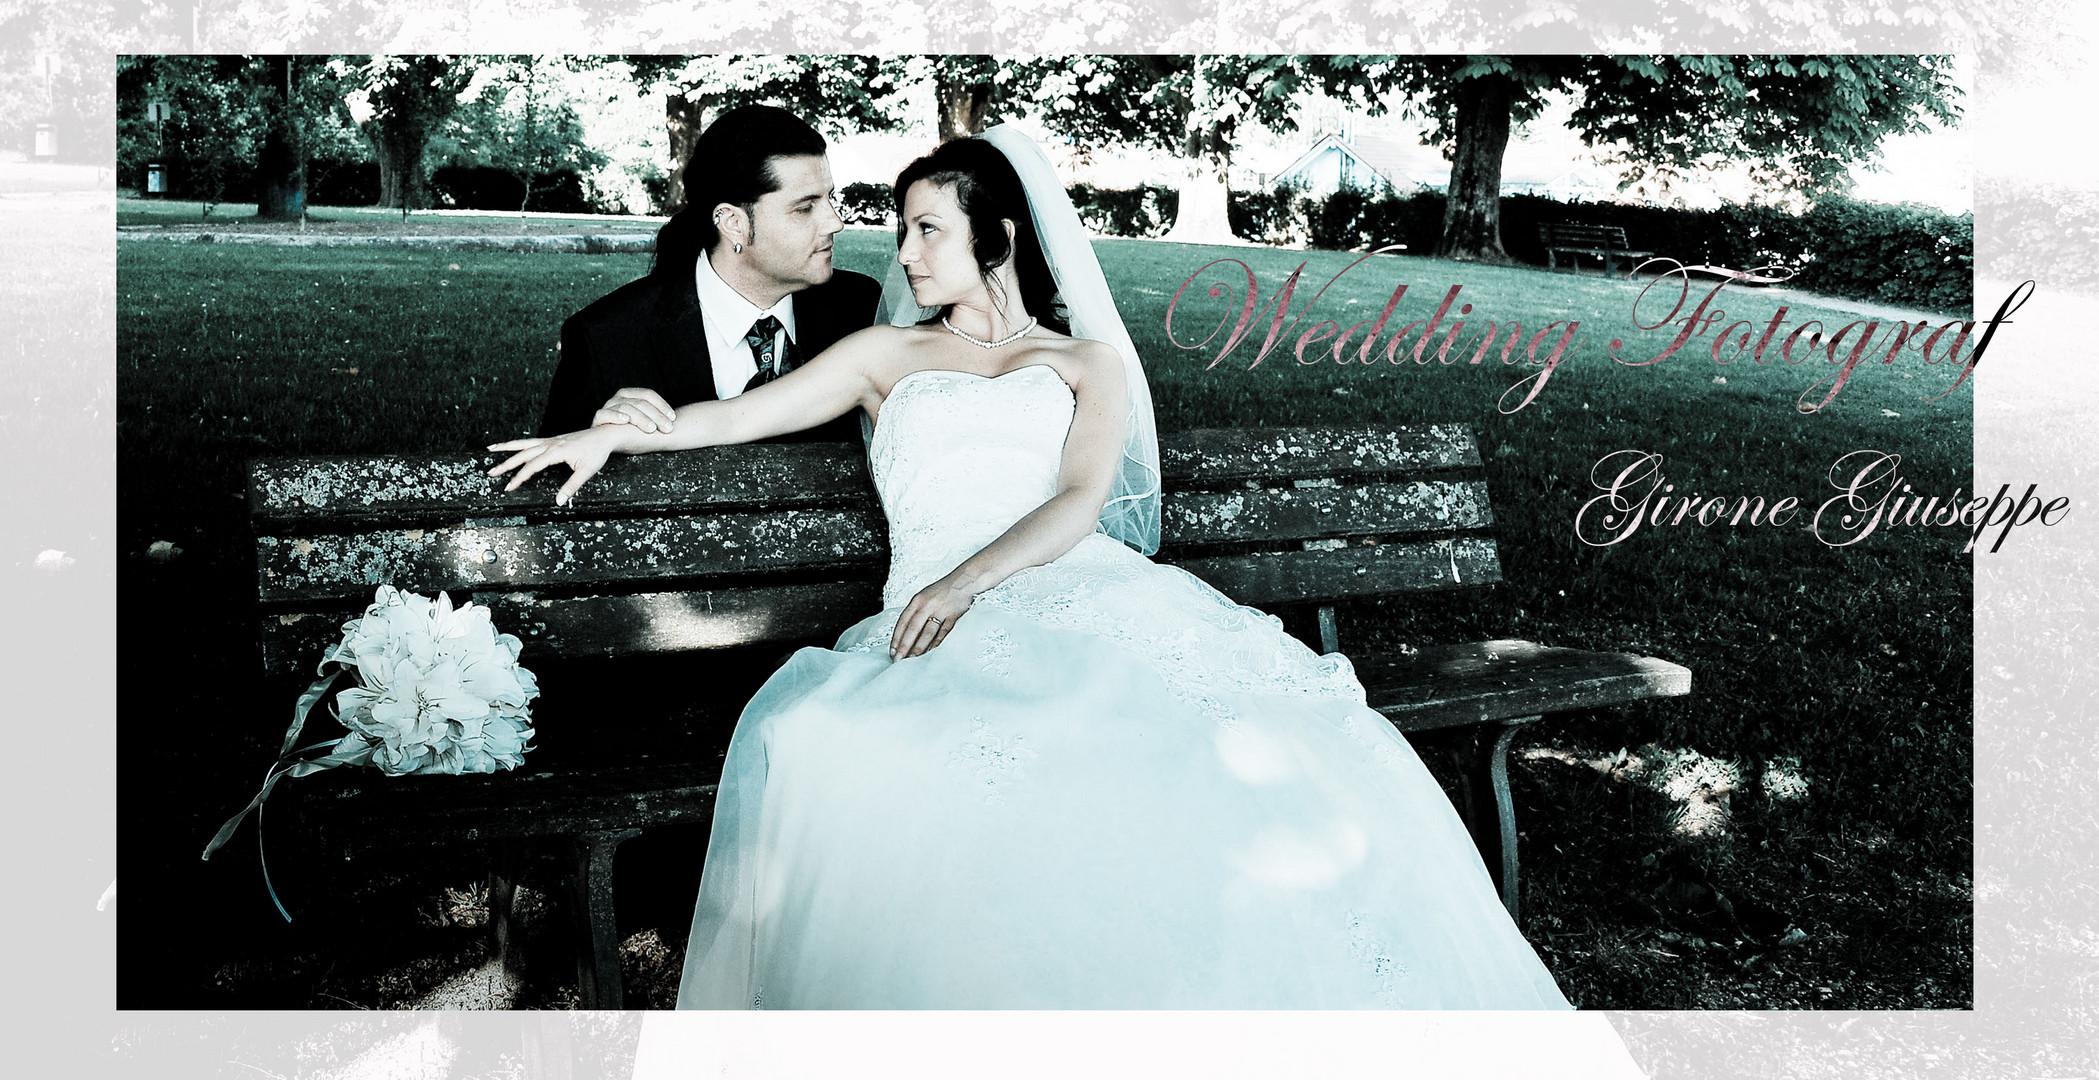 Wedding Fotograf Girone Giuseppe